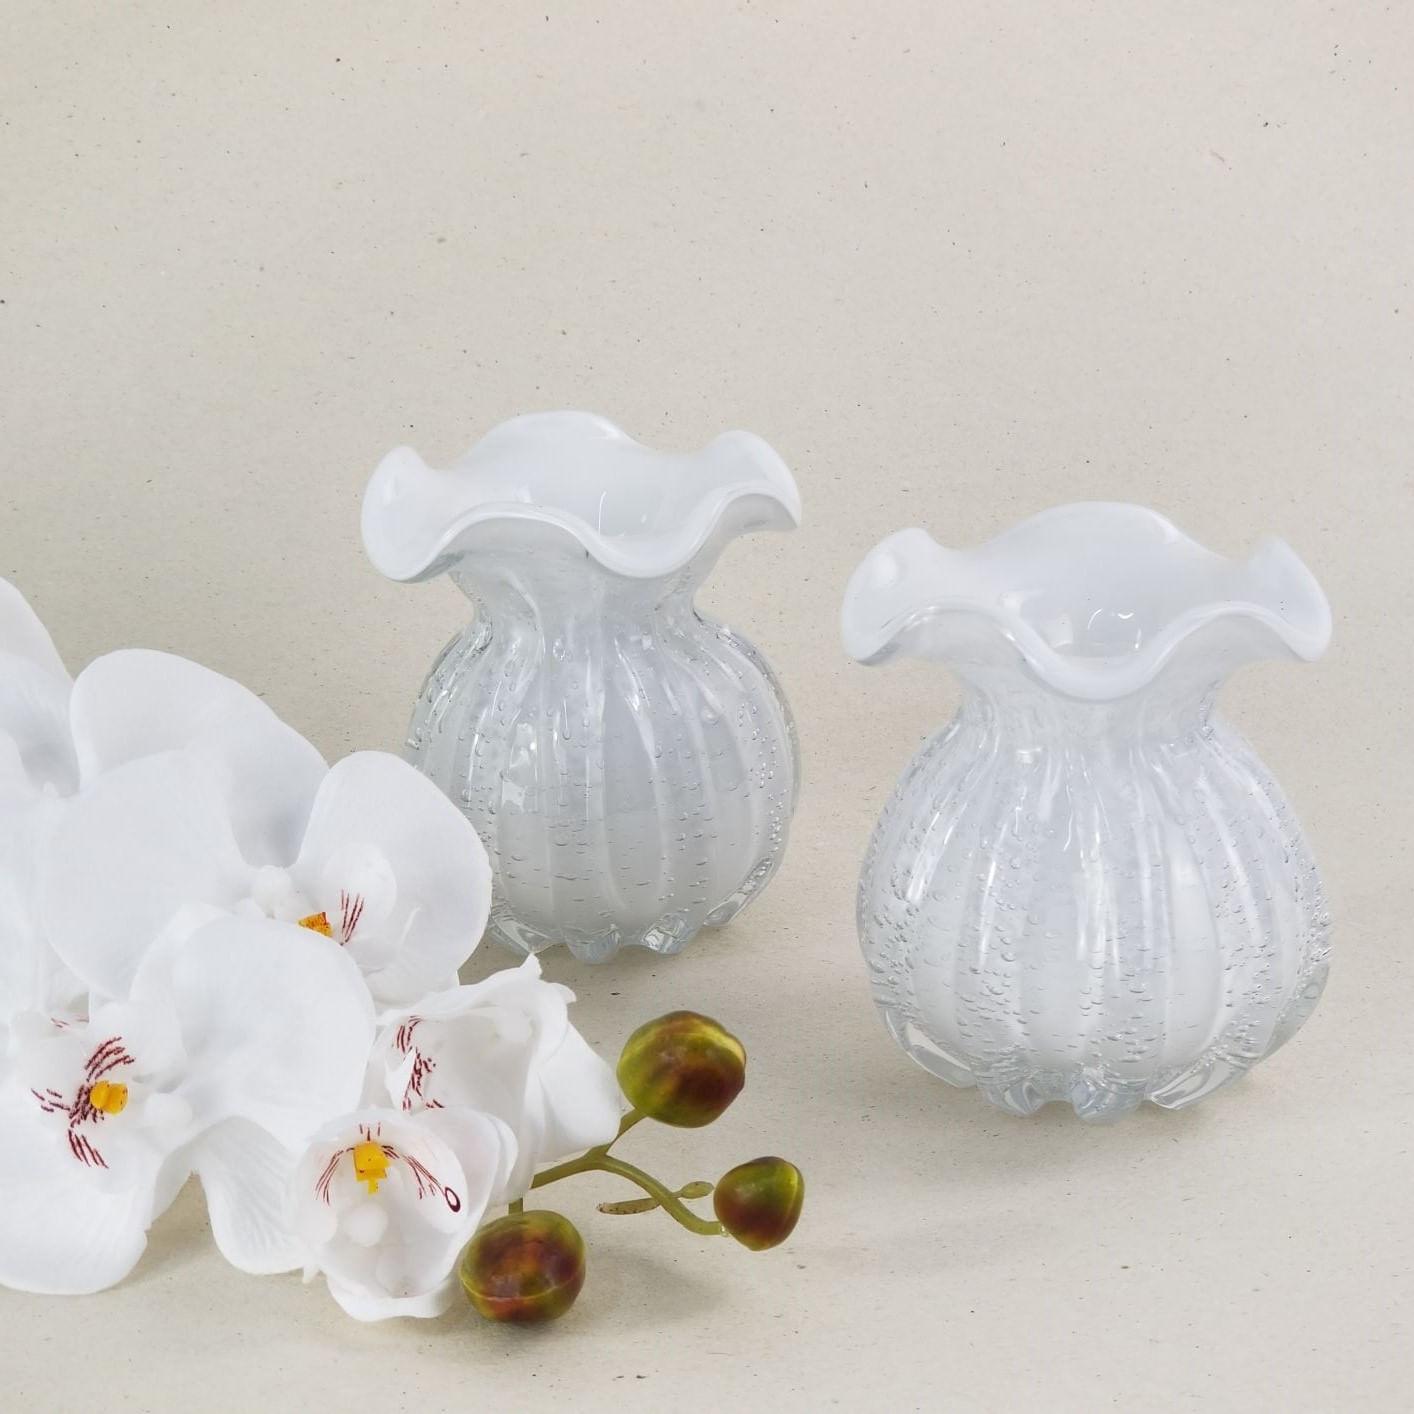 Vaso Trouxinha Decorativa de Murano Branco - Importado